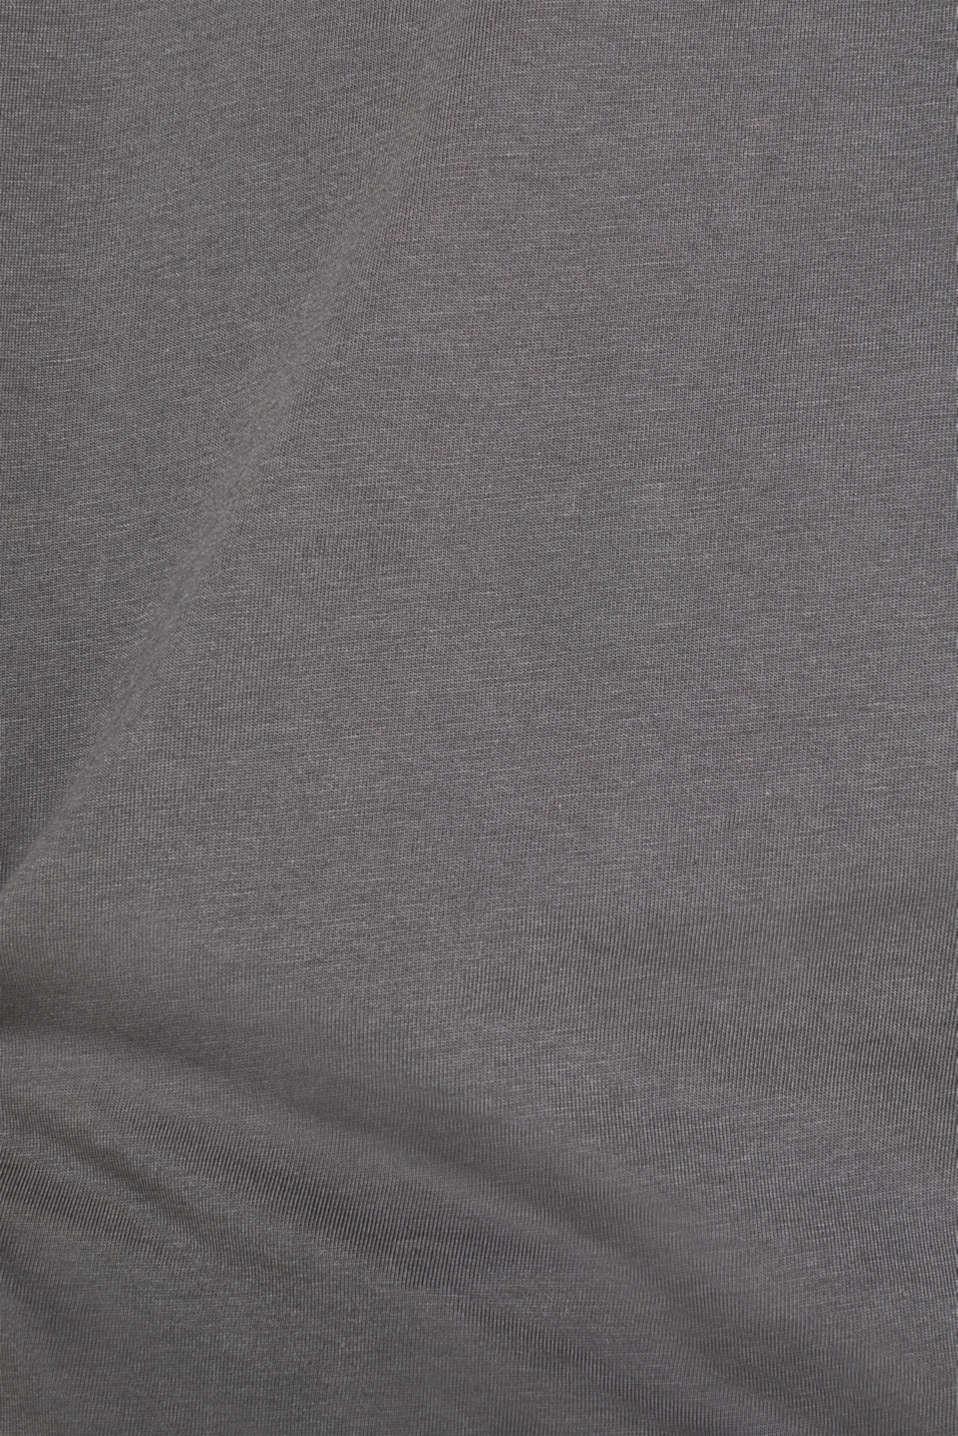 Jersey T-shirt in 100% cotton, DARK GREY, detail image number 4